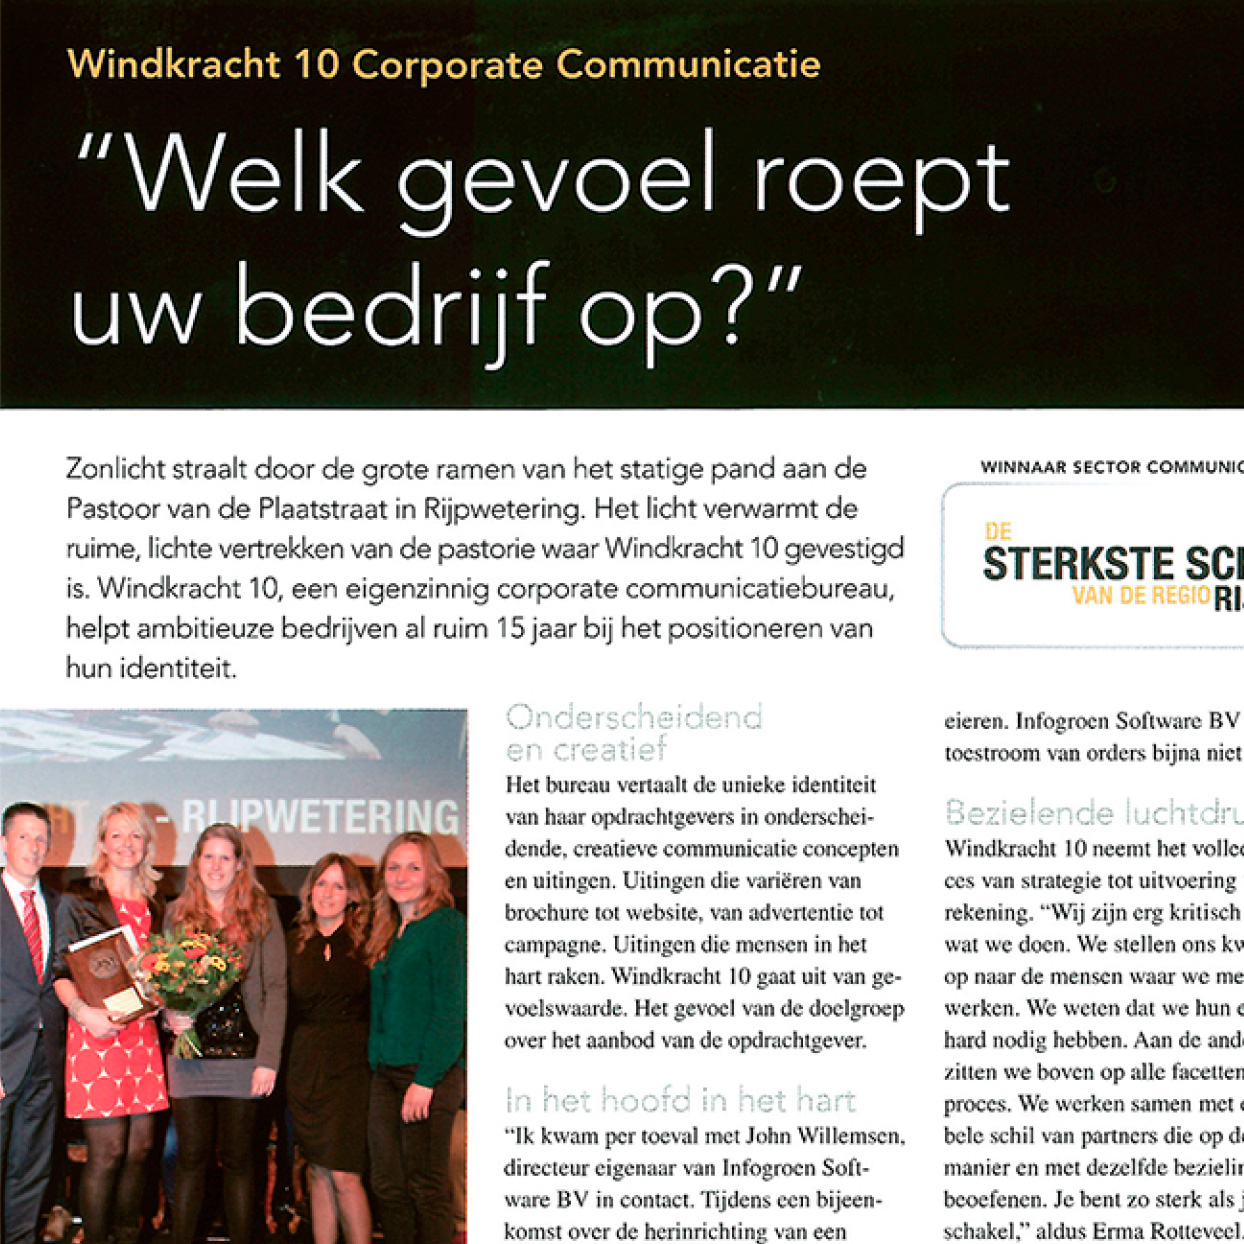 Windkracht 10 winnaar sector communicatie  Rijnstreek Business  20-04-13